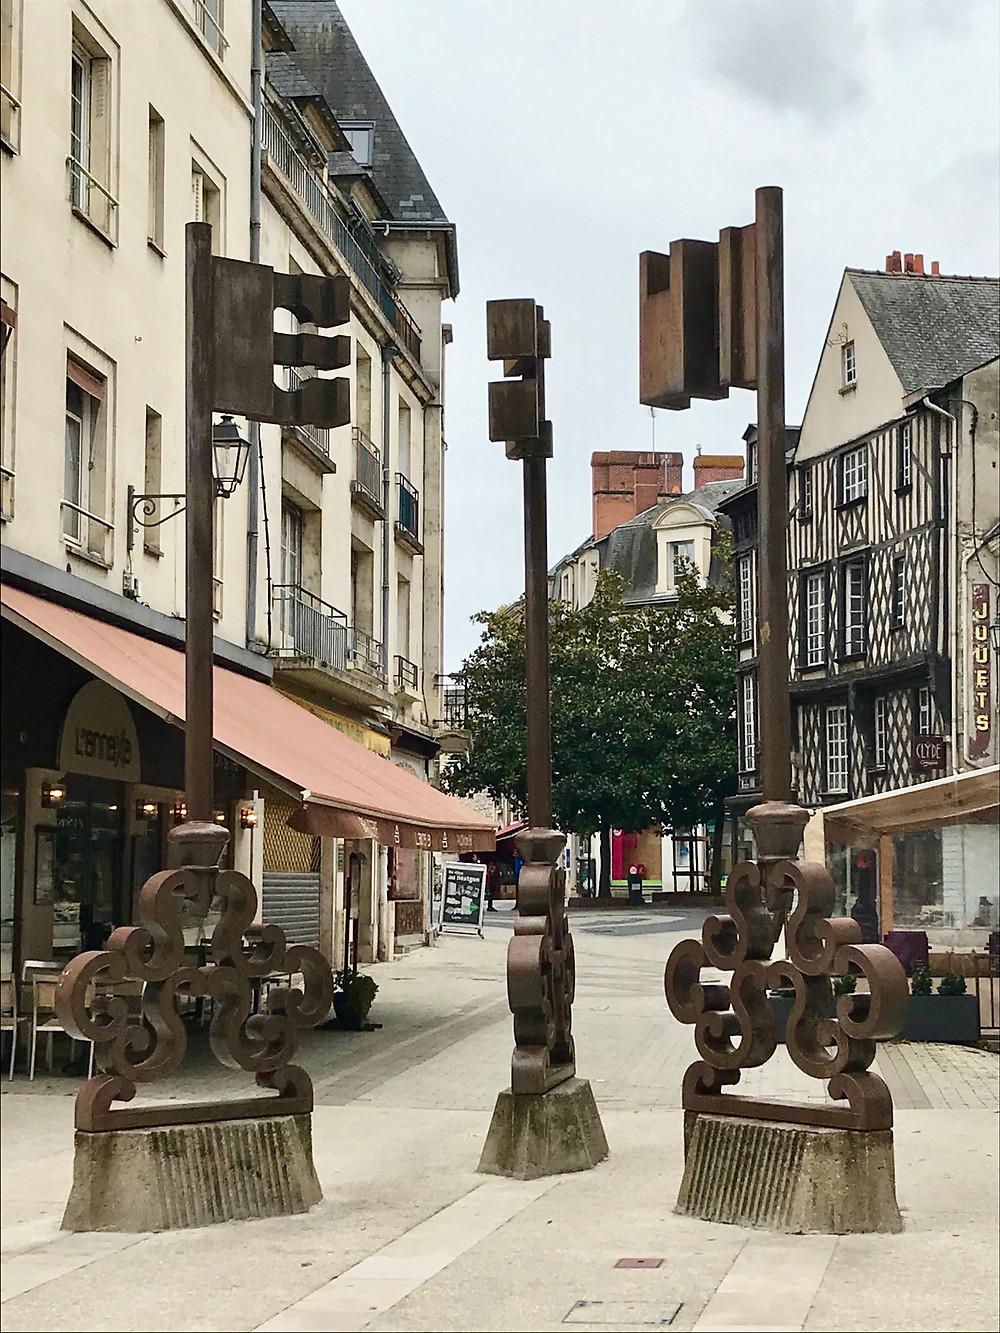 blois-old-town-art-three-keys-sculpture